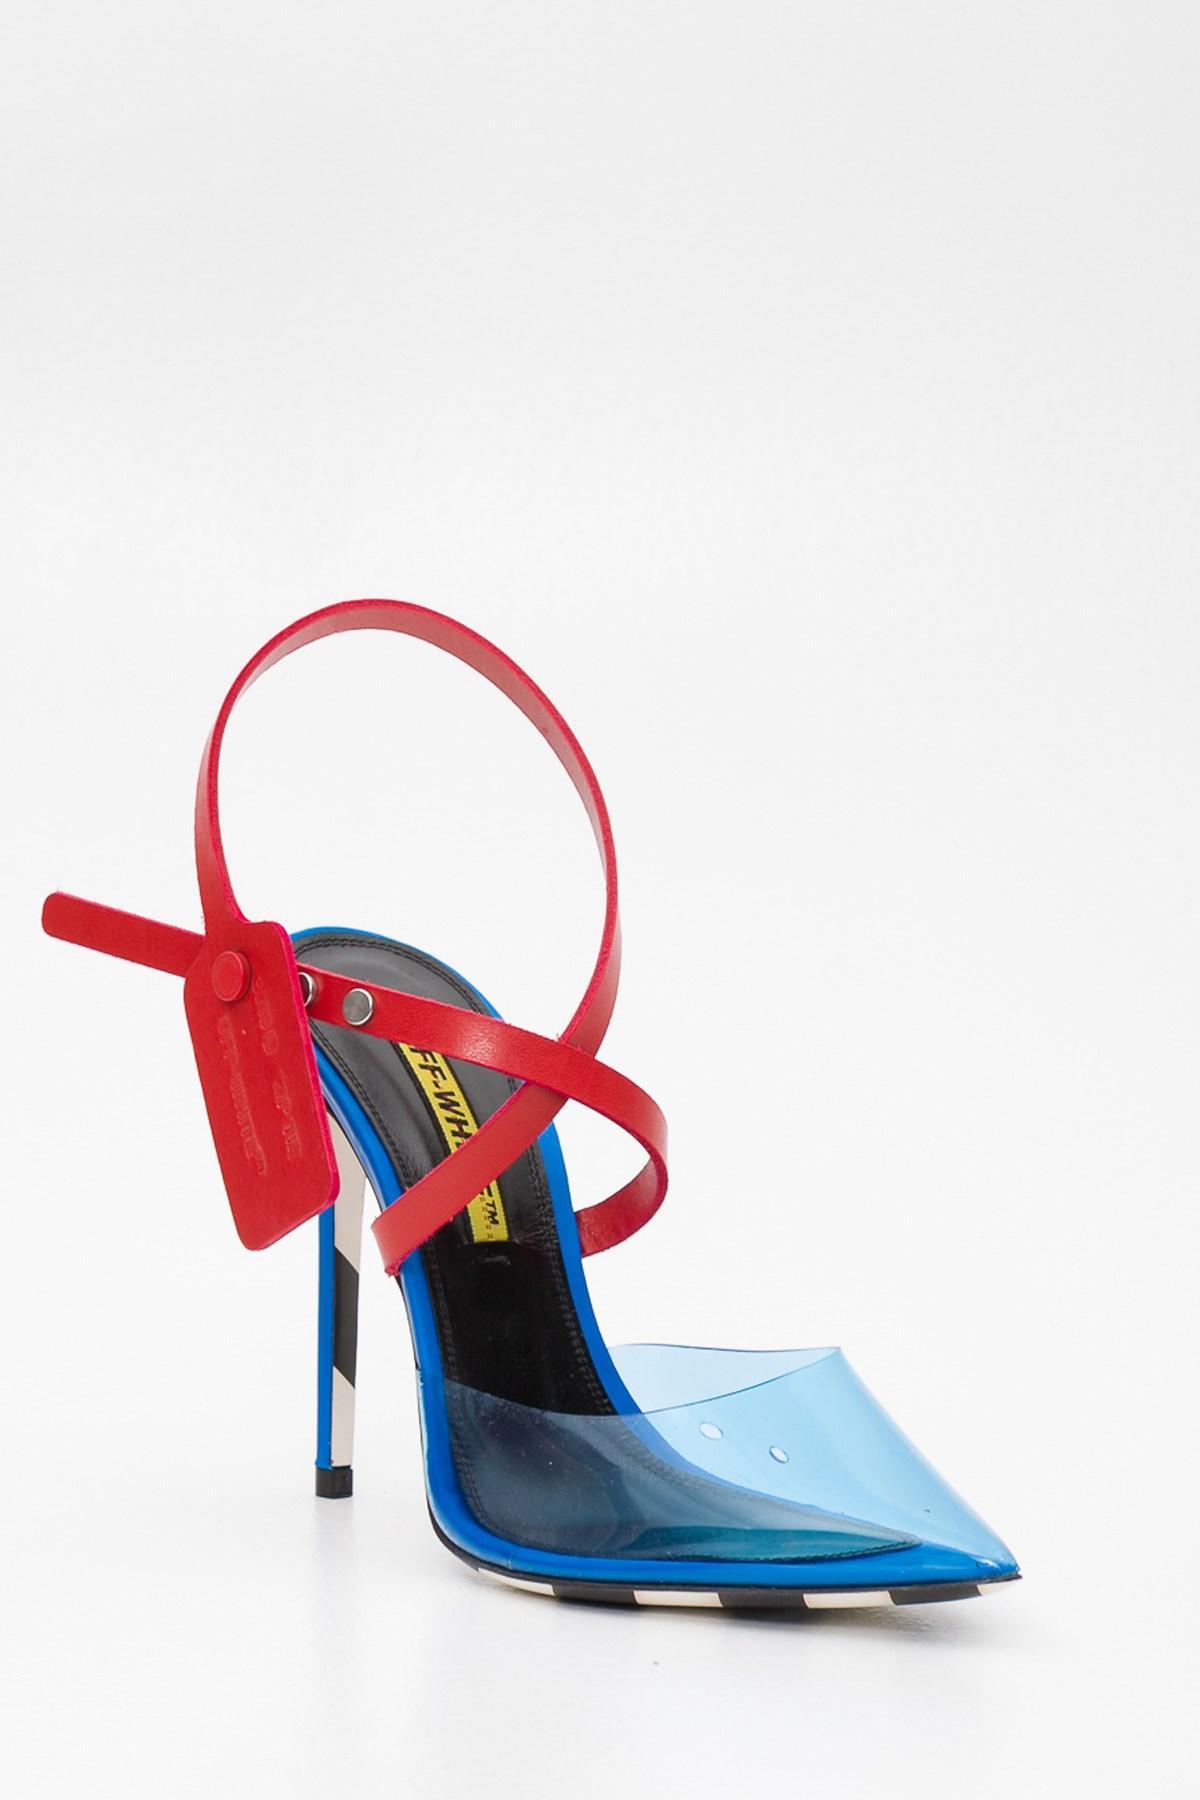 o Virgil Abloh Leather Blue Jelly Mule